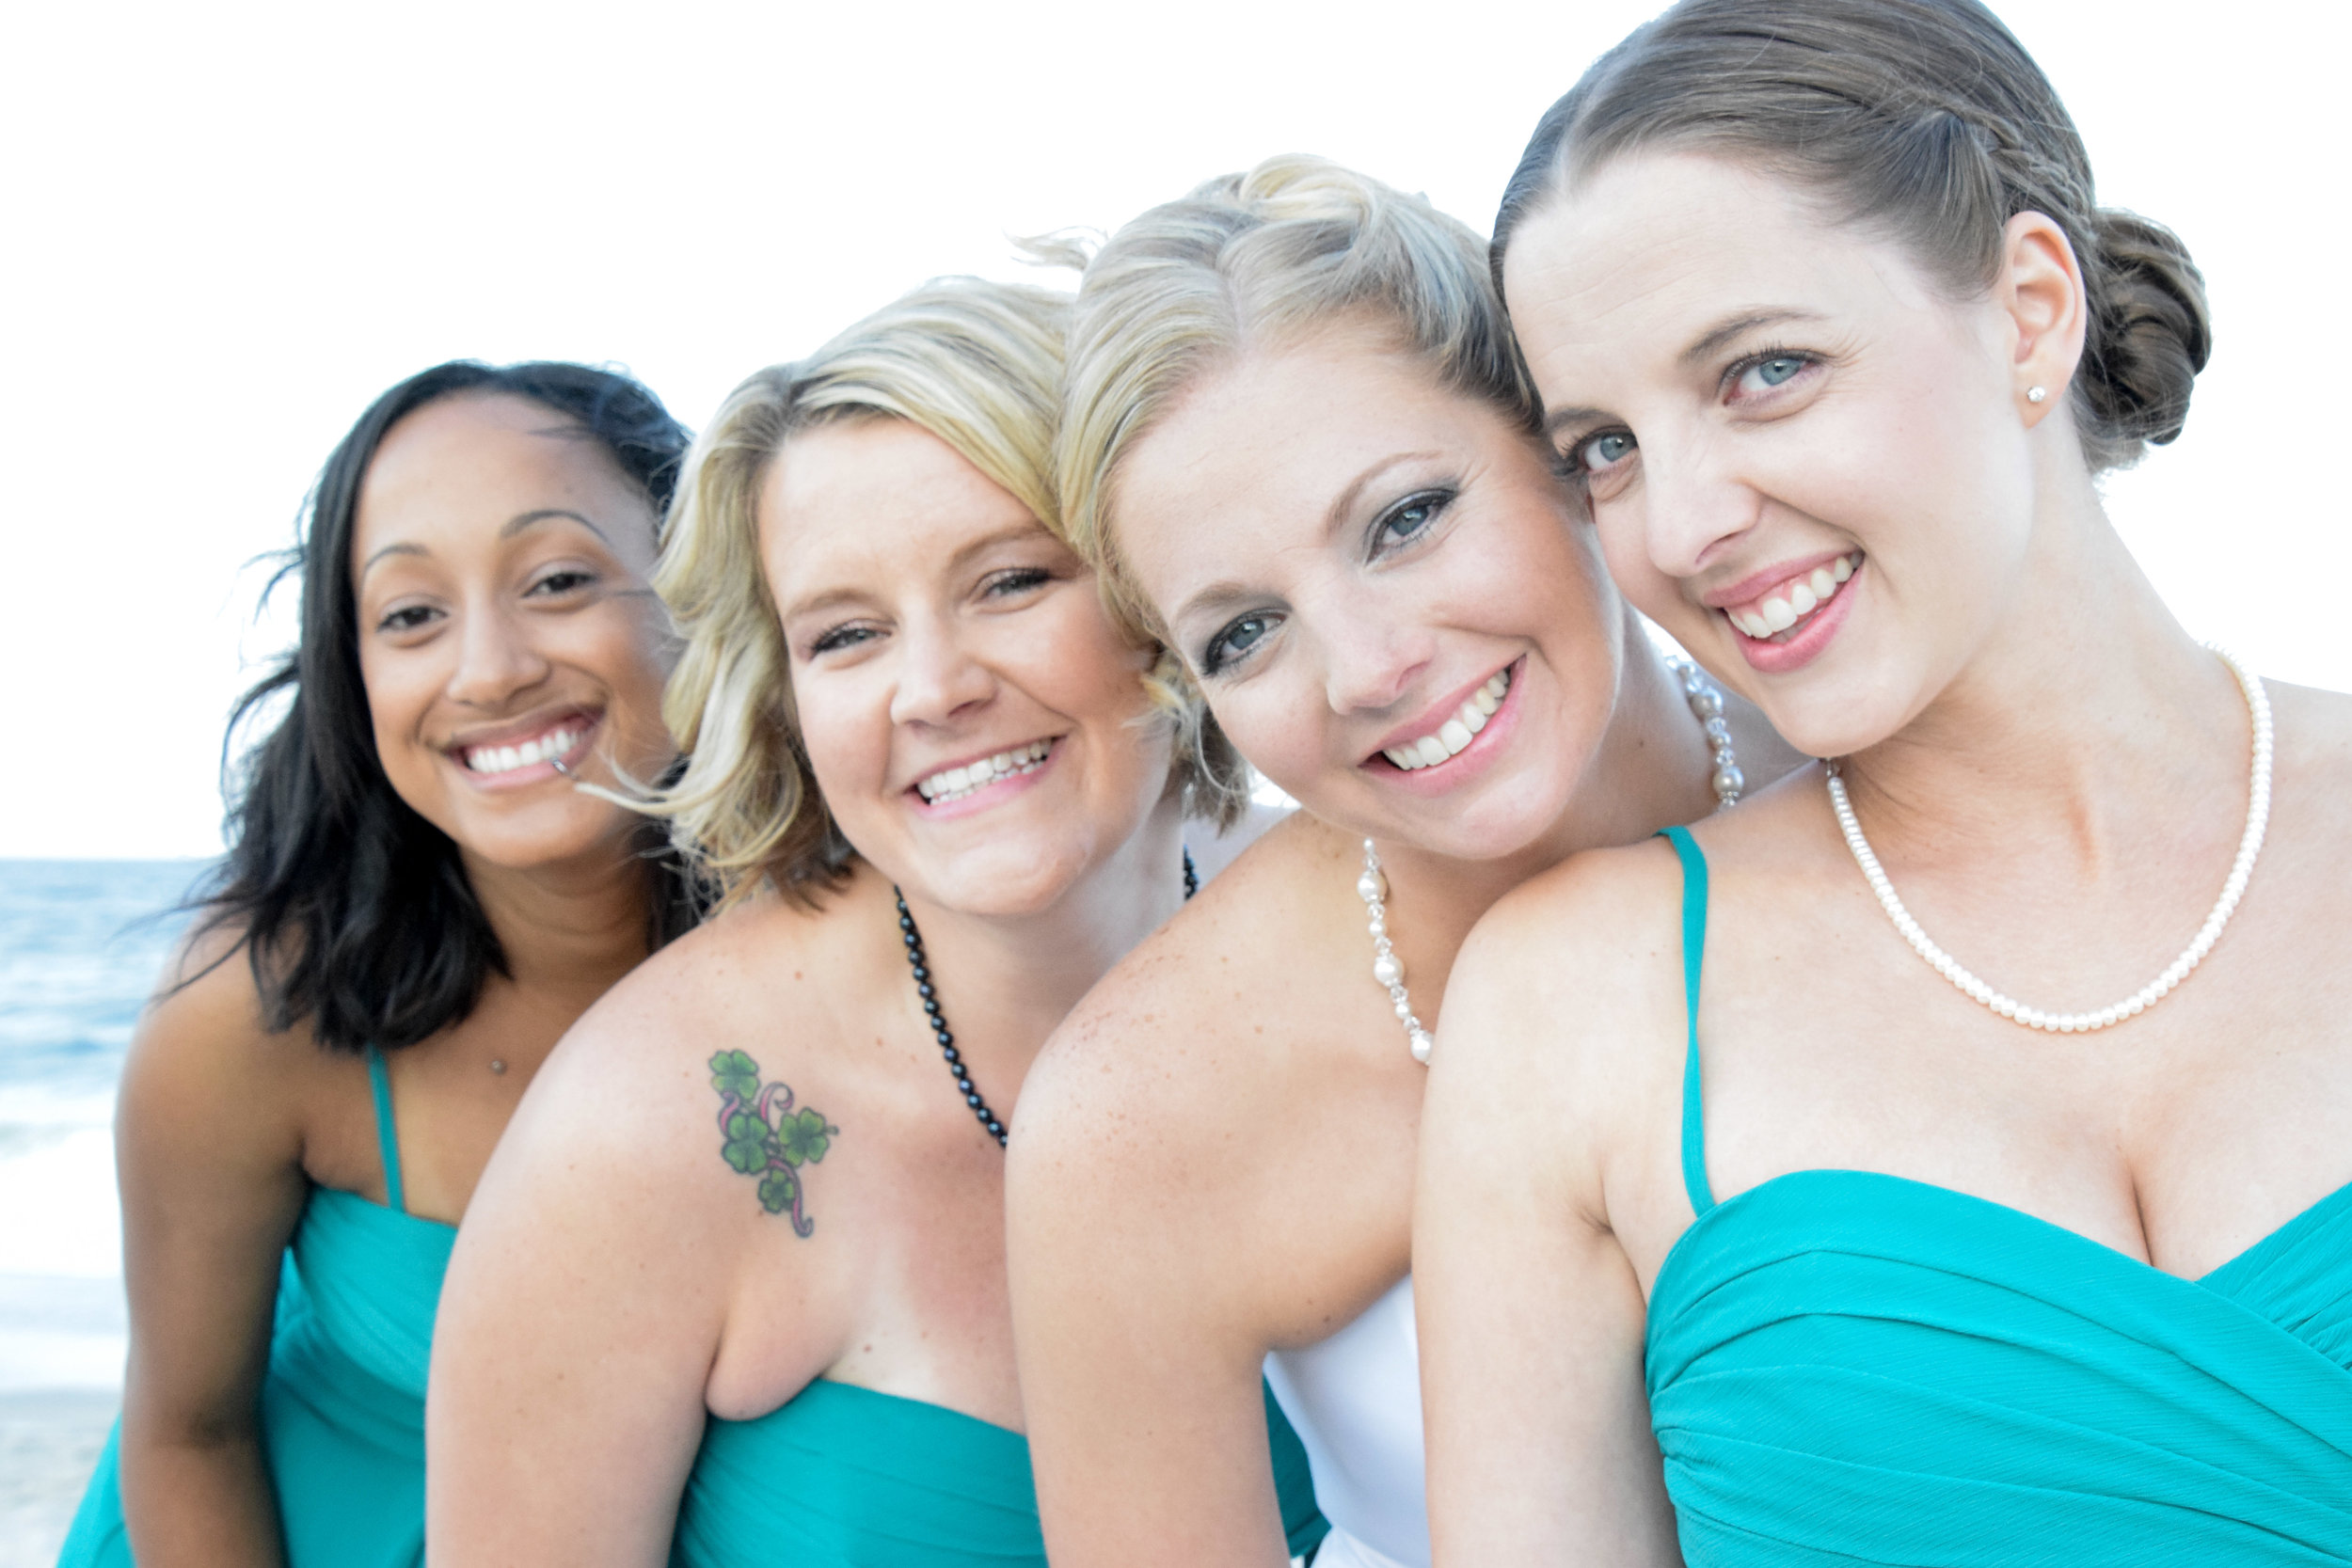 Bride and three bridesmaids.